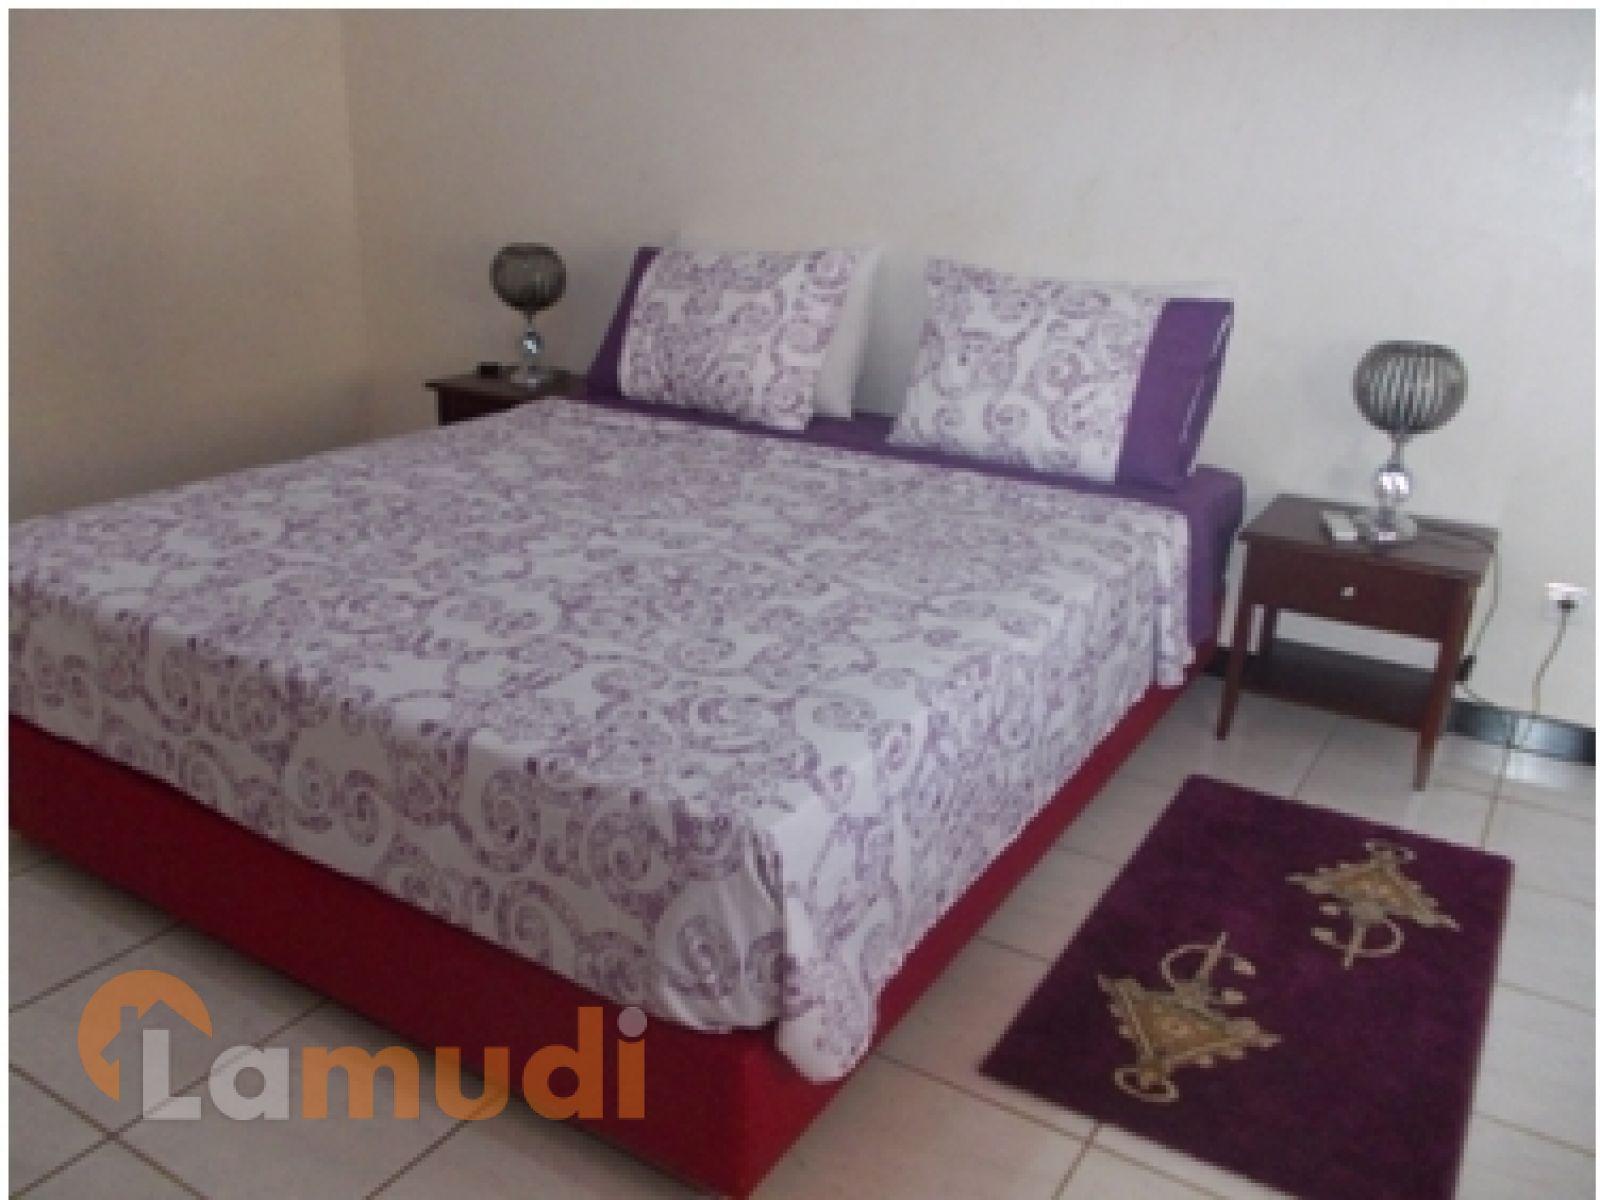 Image Sale apartment avola siracusa 1